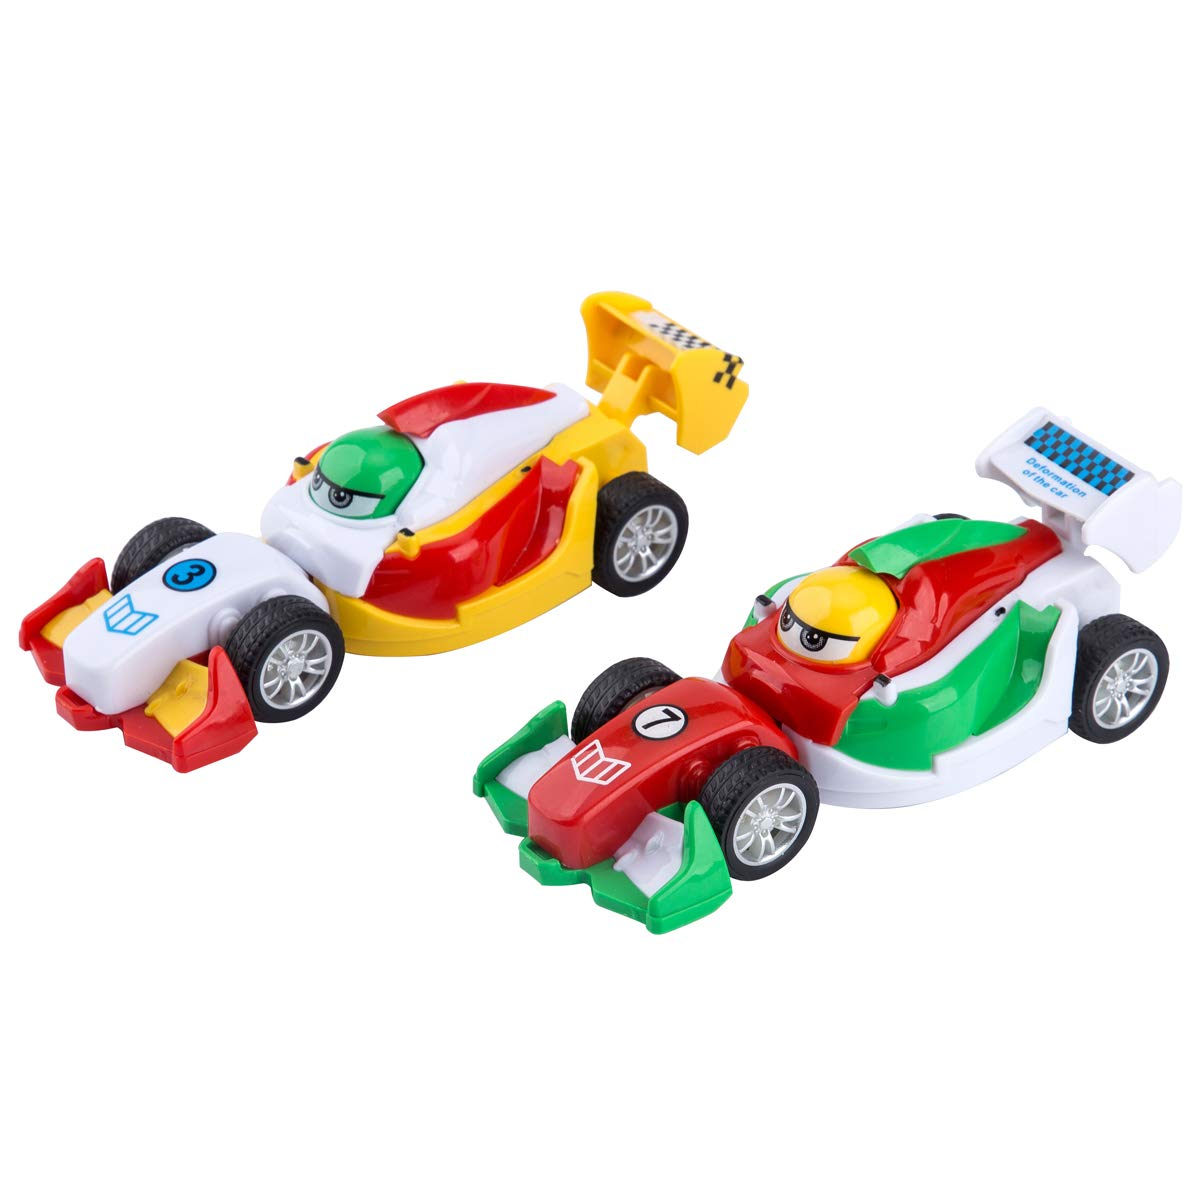 UDS Egg Race Car Pocket Car for Kids Foldable Inertia Car for Boys and Girls 2 Pack